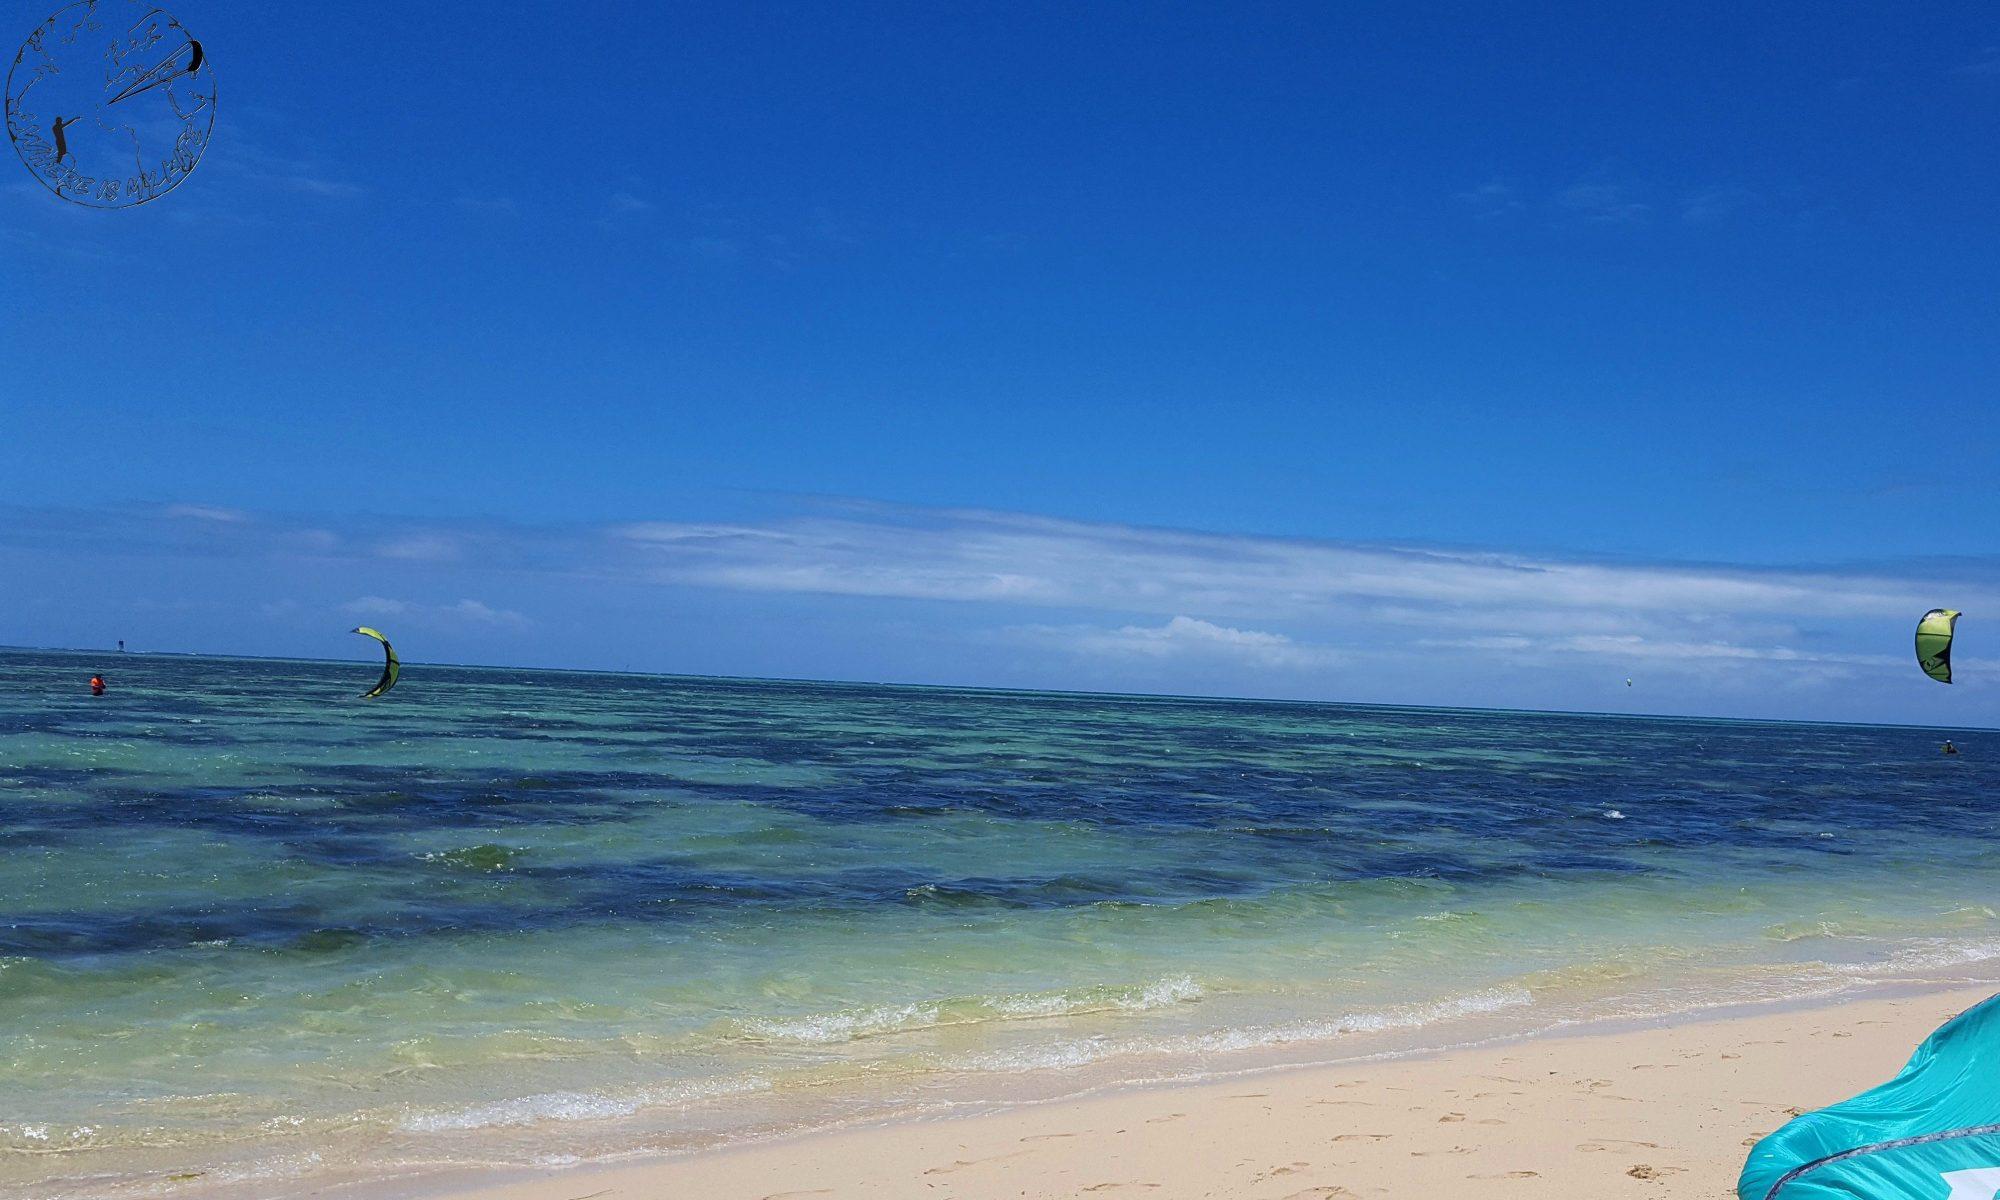 Kitesurf à l'Îlot Maître, Polynésie